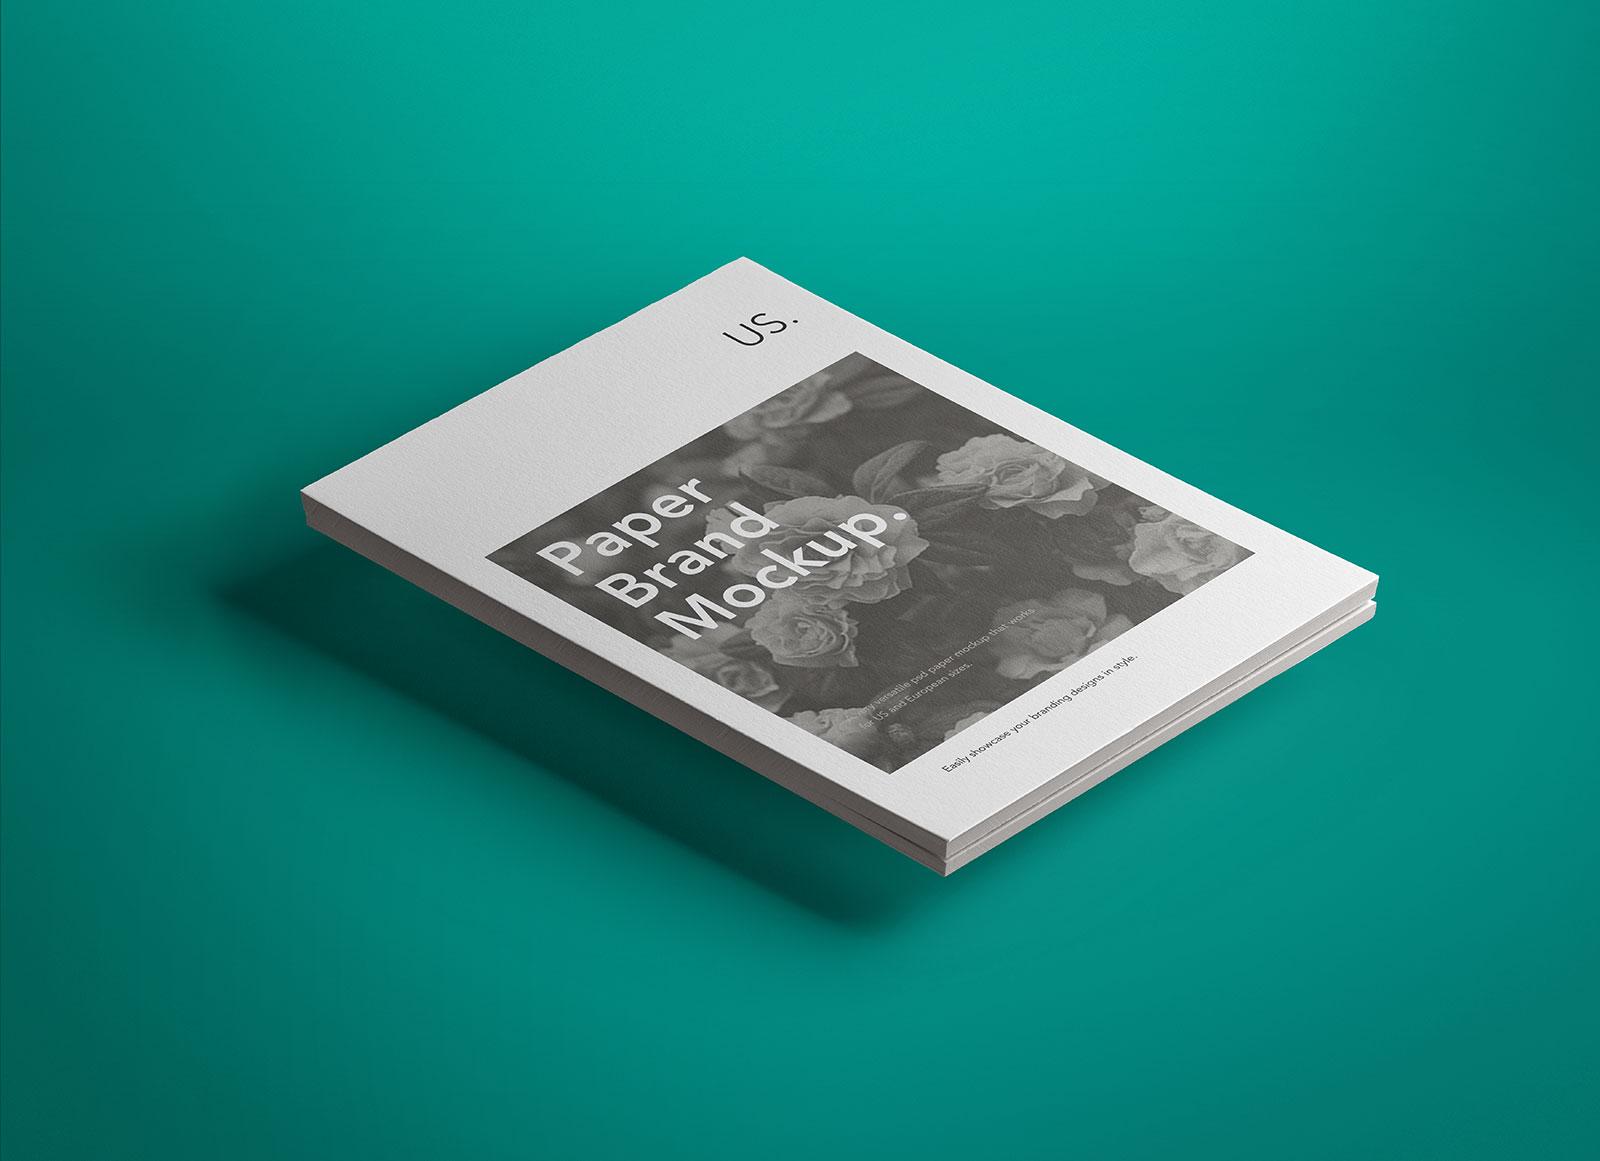 Free-Paper-Brand-Isometric-Presentation-Mockup-PSD